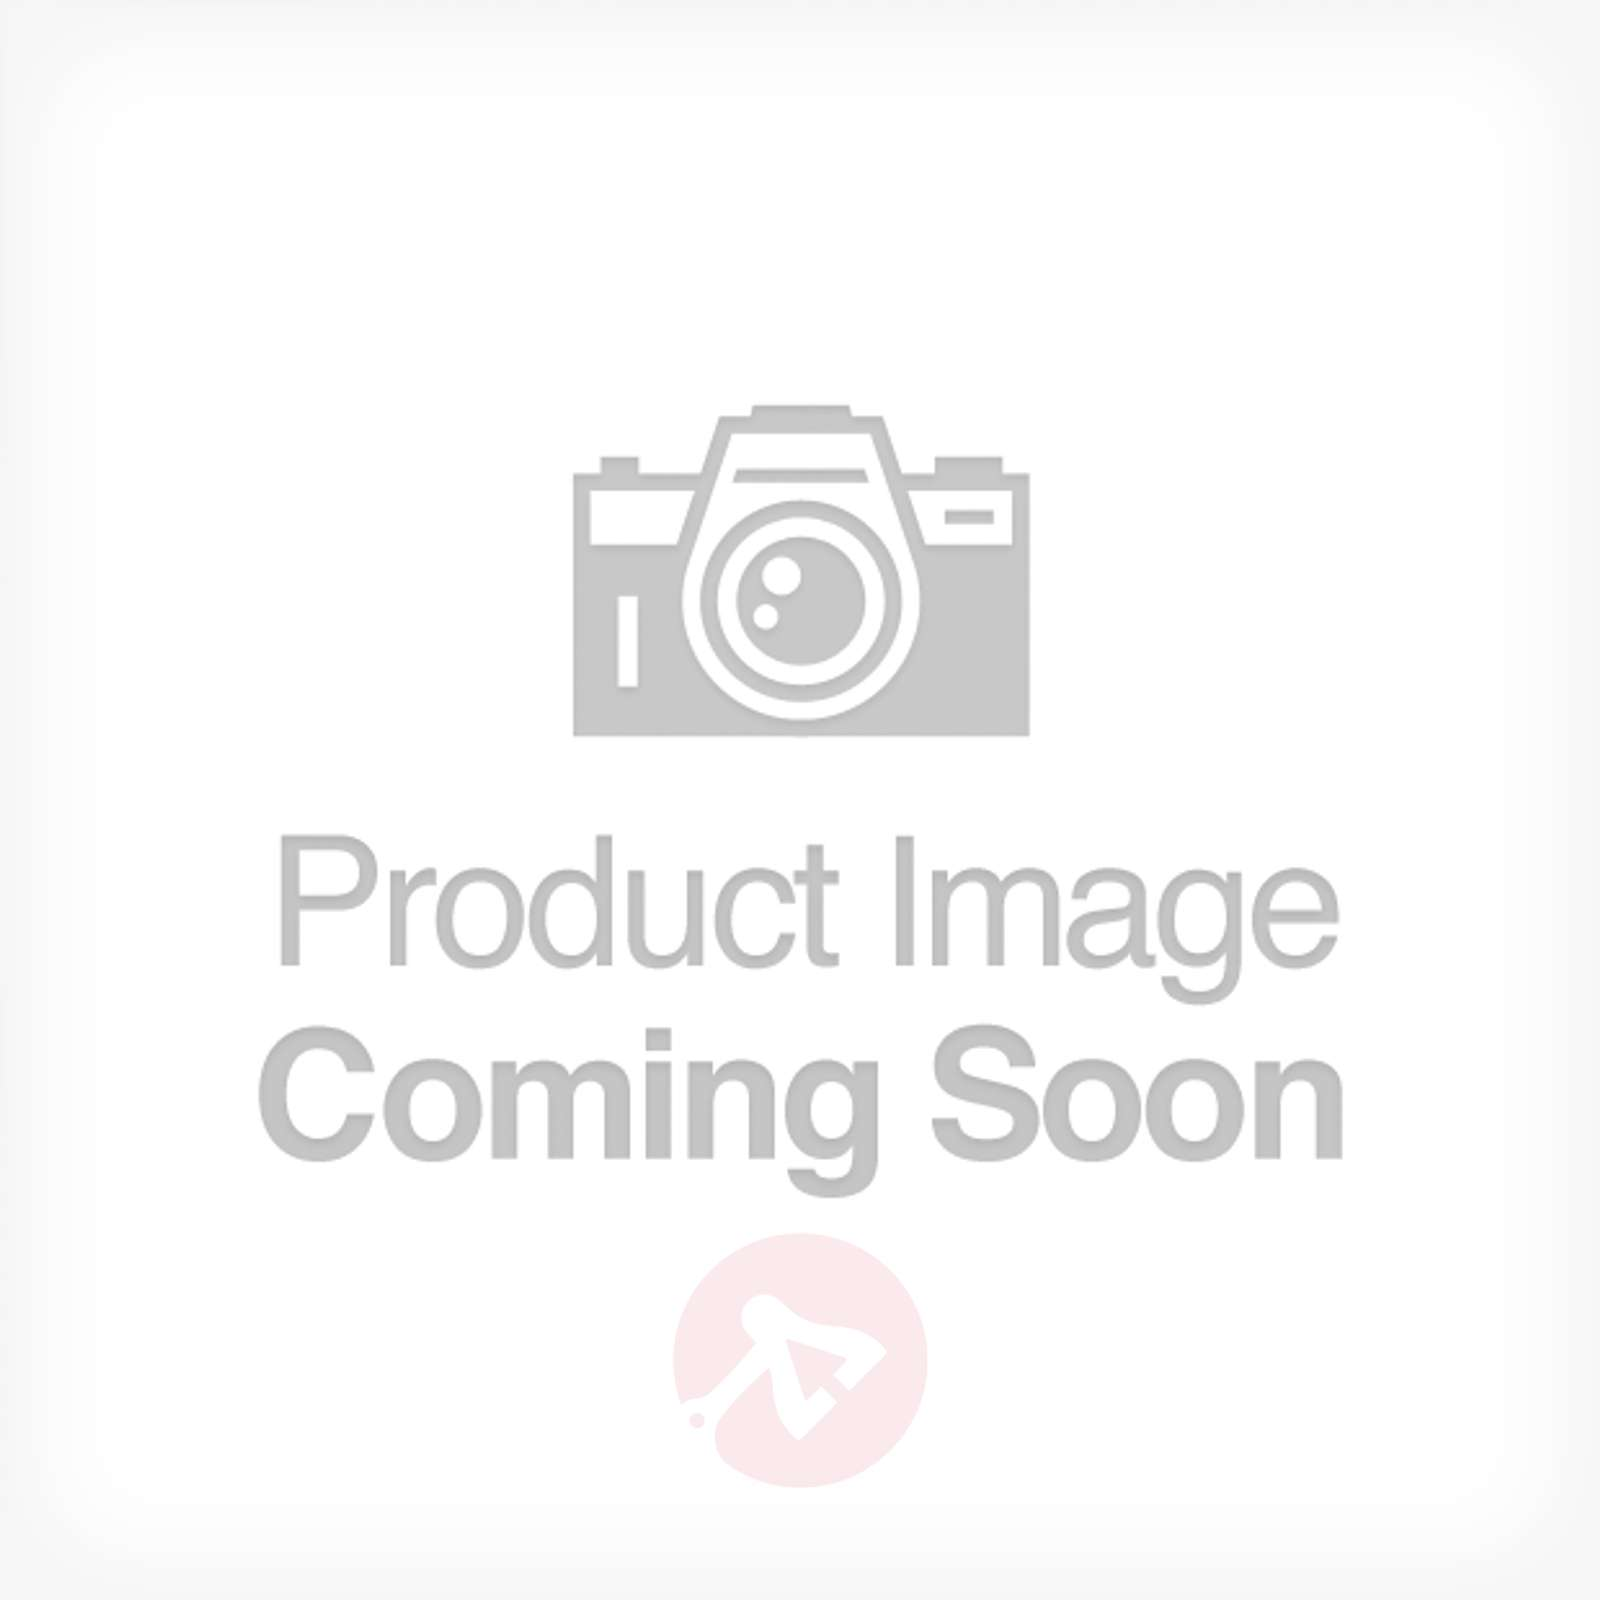 Delta Light Boxy 2+LED 3033 outdoor spotlight IP53-2520060X-01